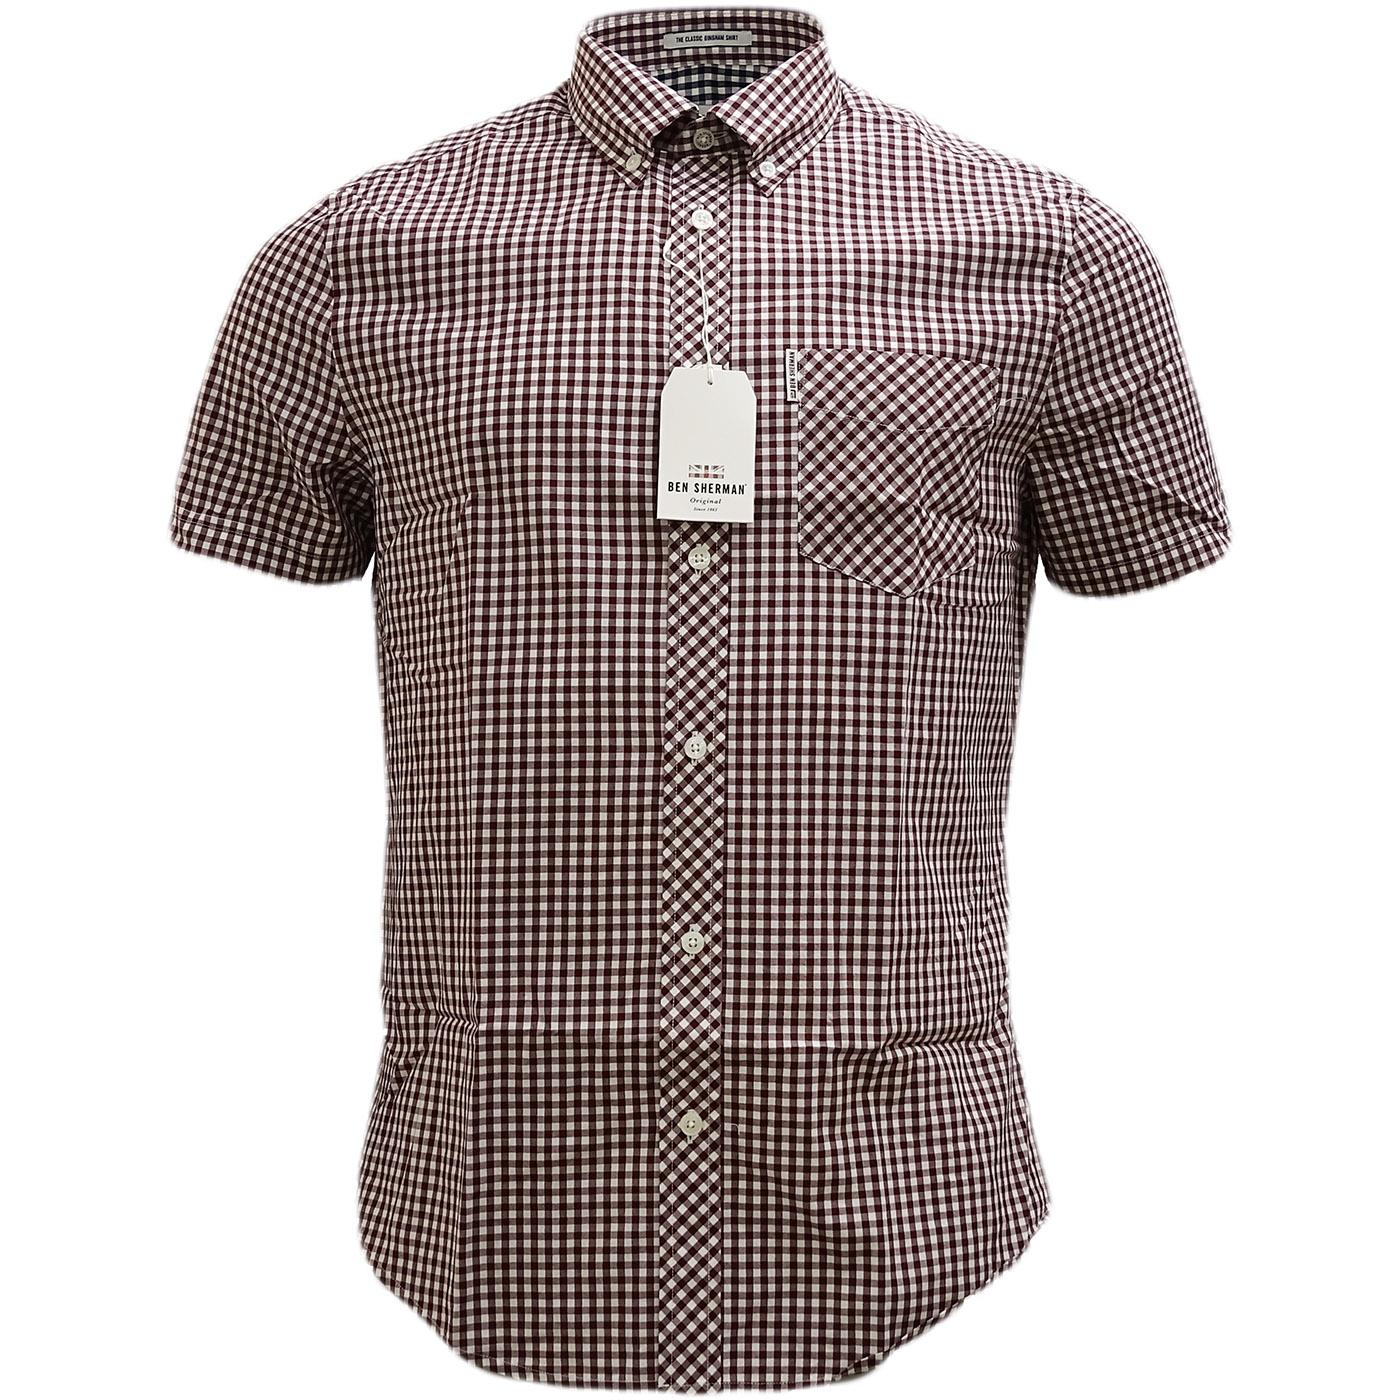 Ben Sherman Original Gingham Check Shirt Ma13603 Ben